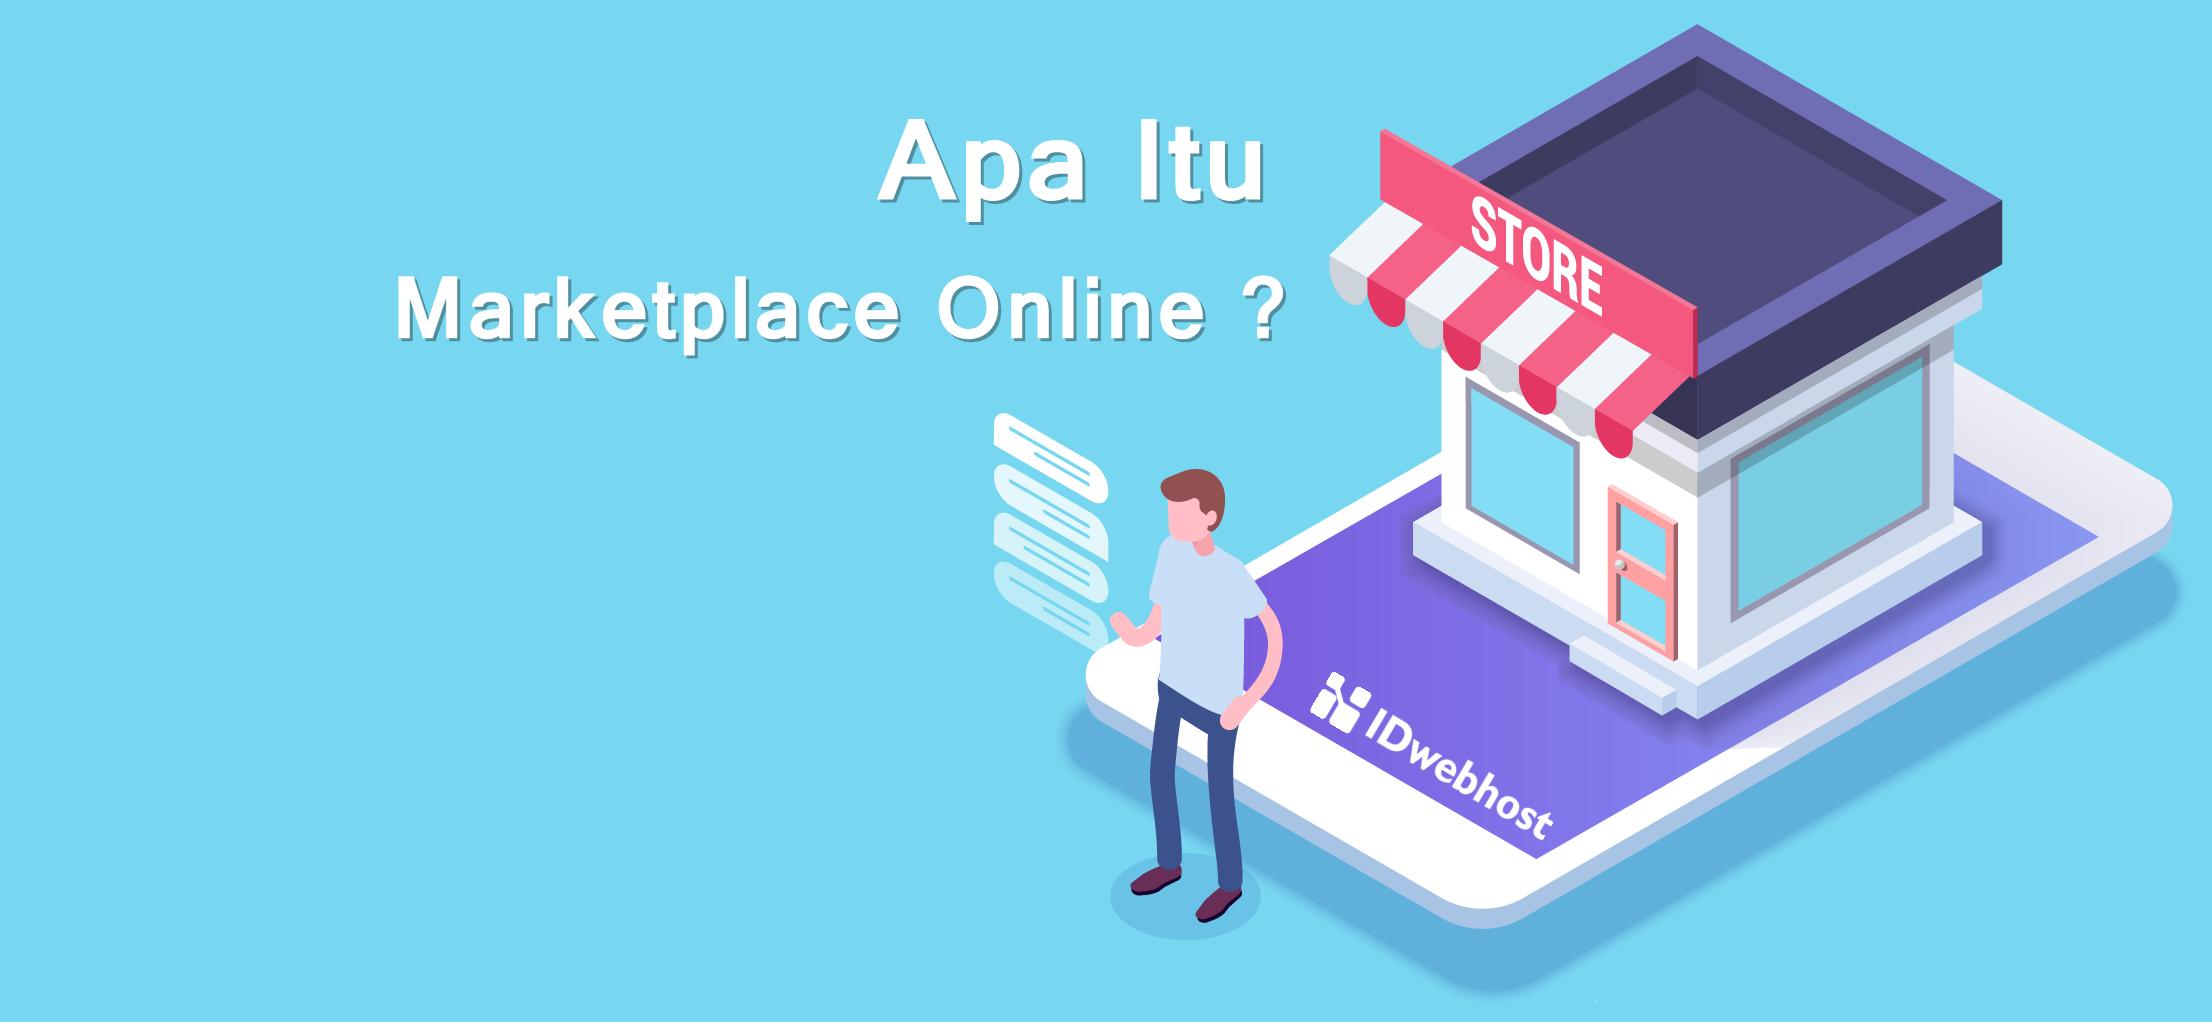 Apa Itu Marketplace Online?